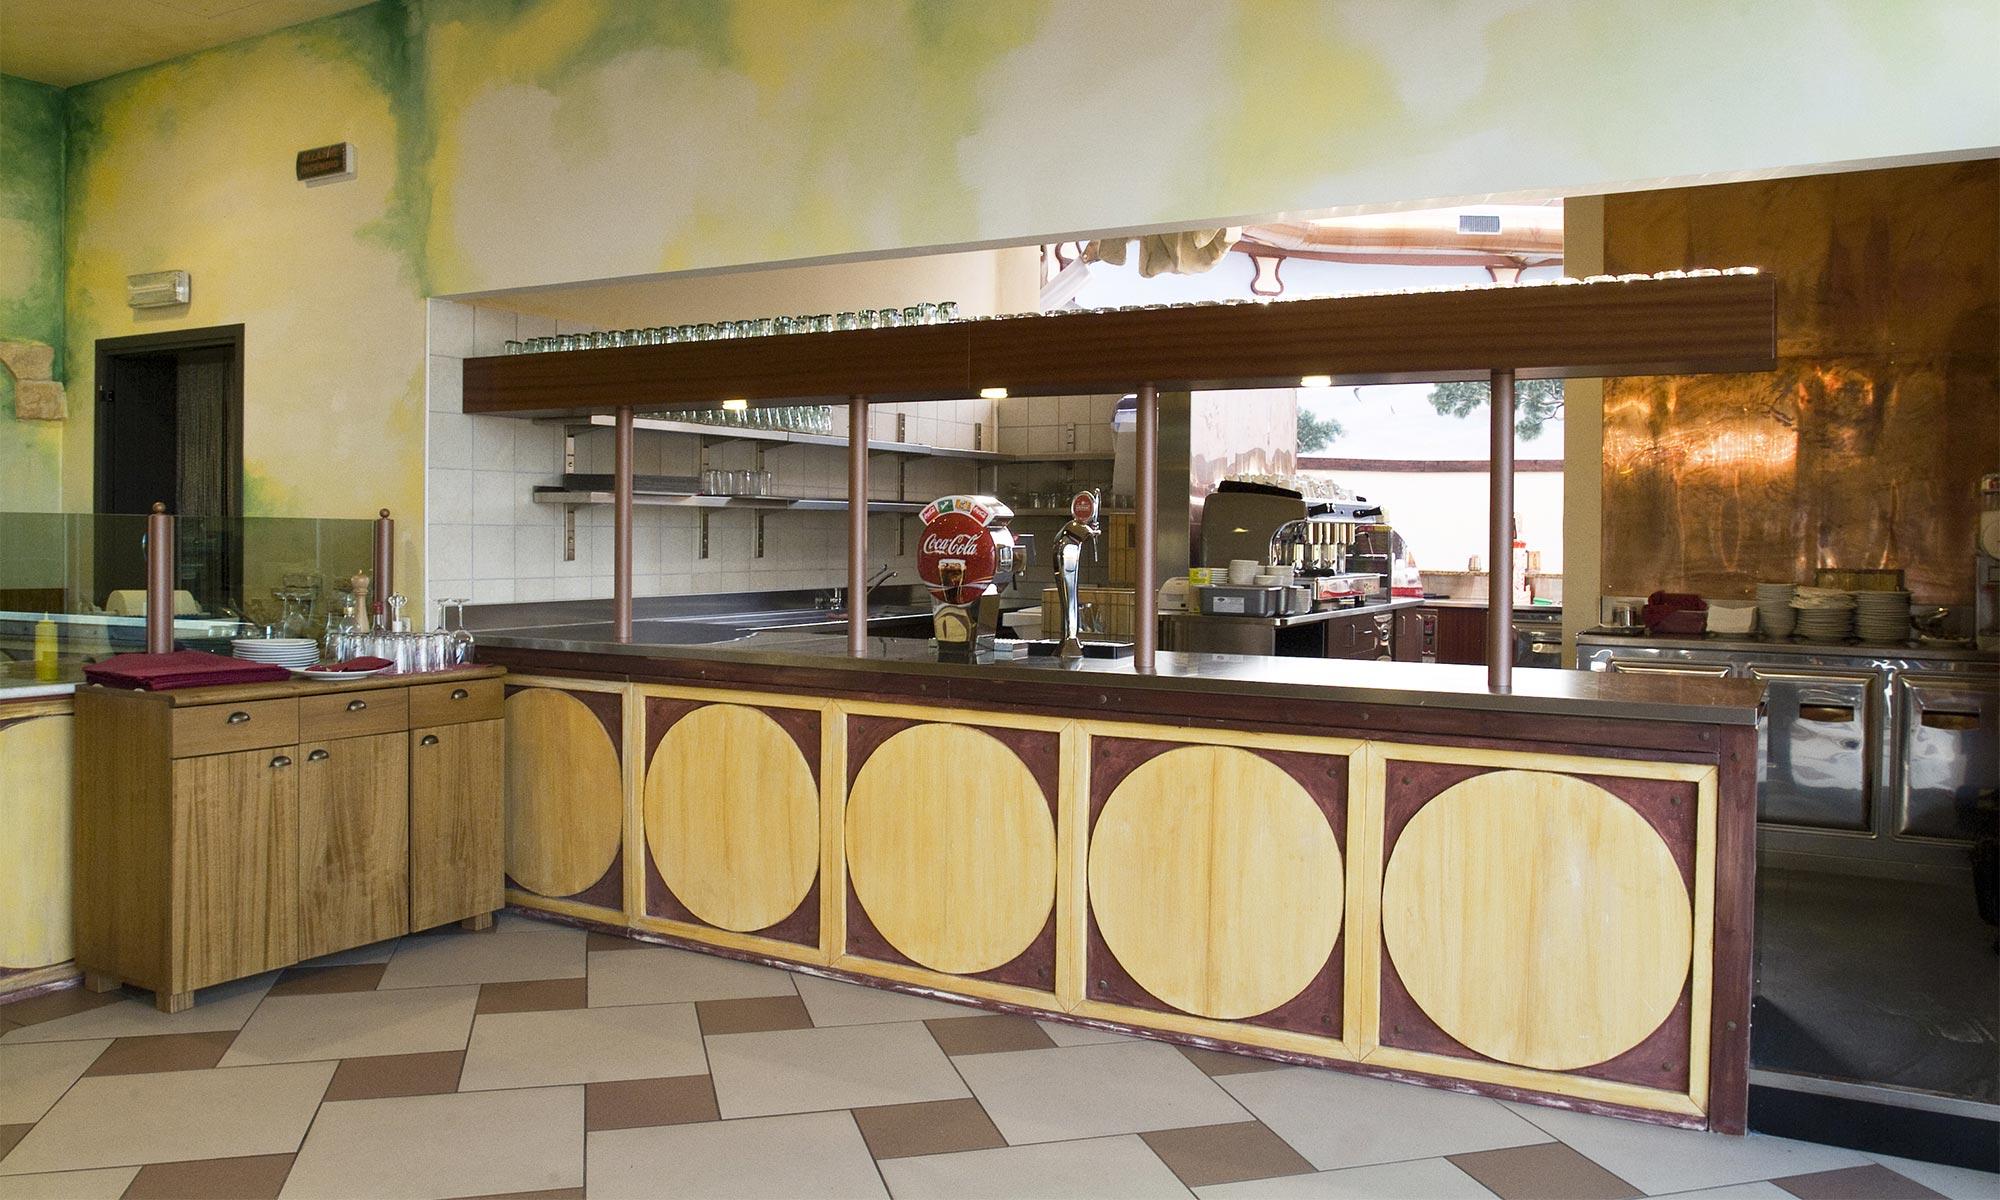 Miragica ristorante sat arredamenti for Sat arredamenti